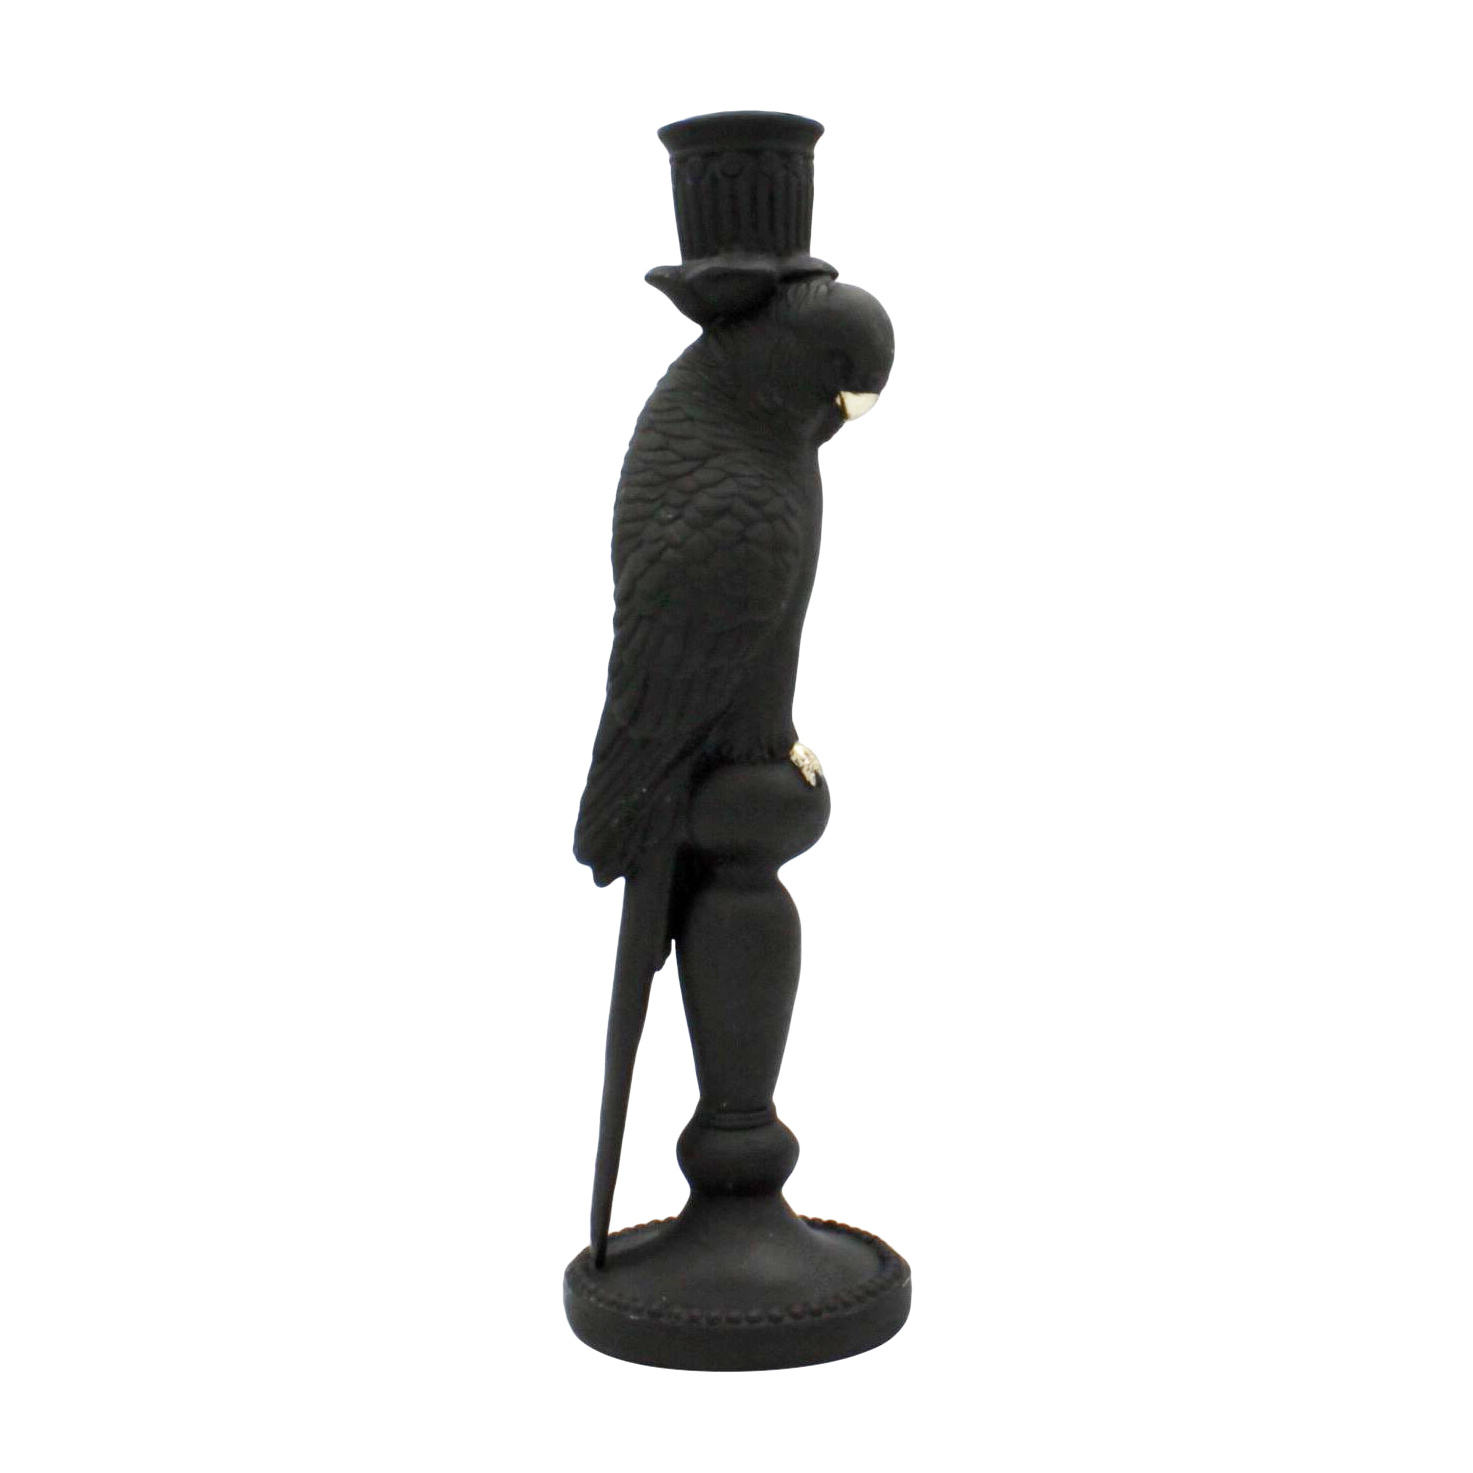 Black parrot candlestick